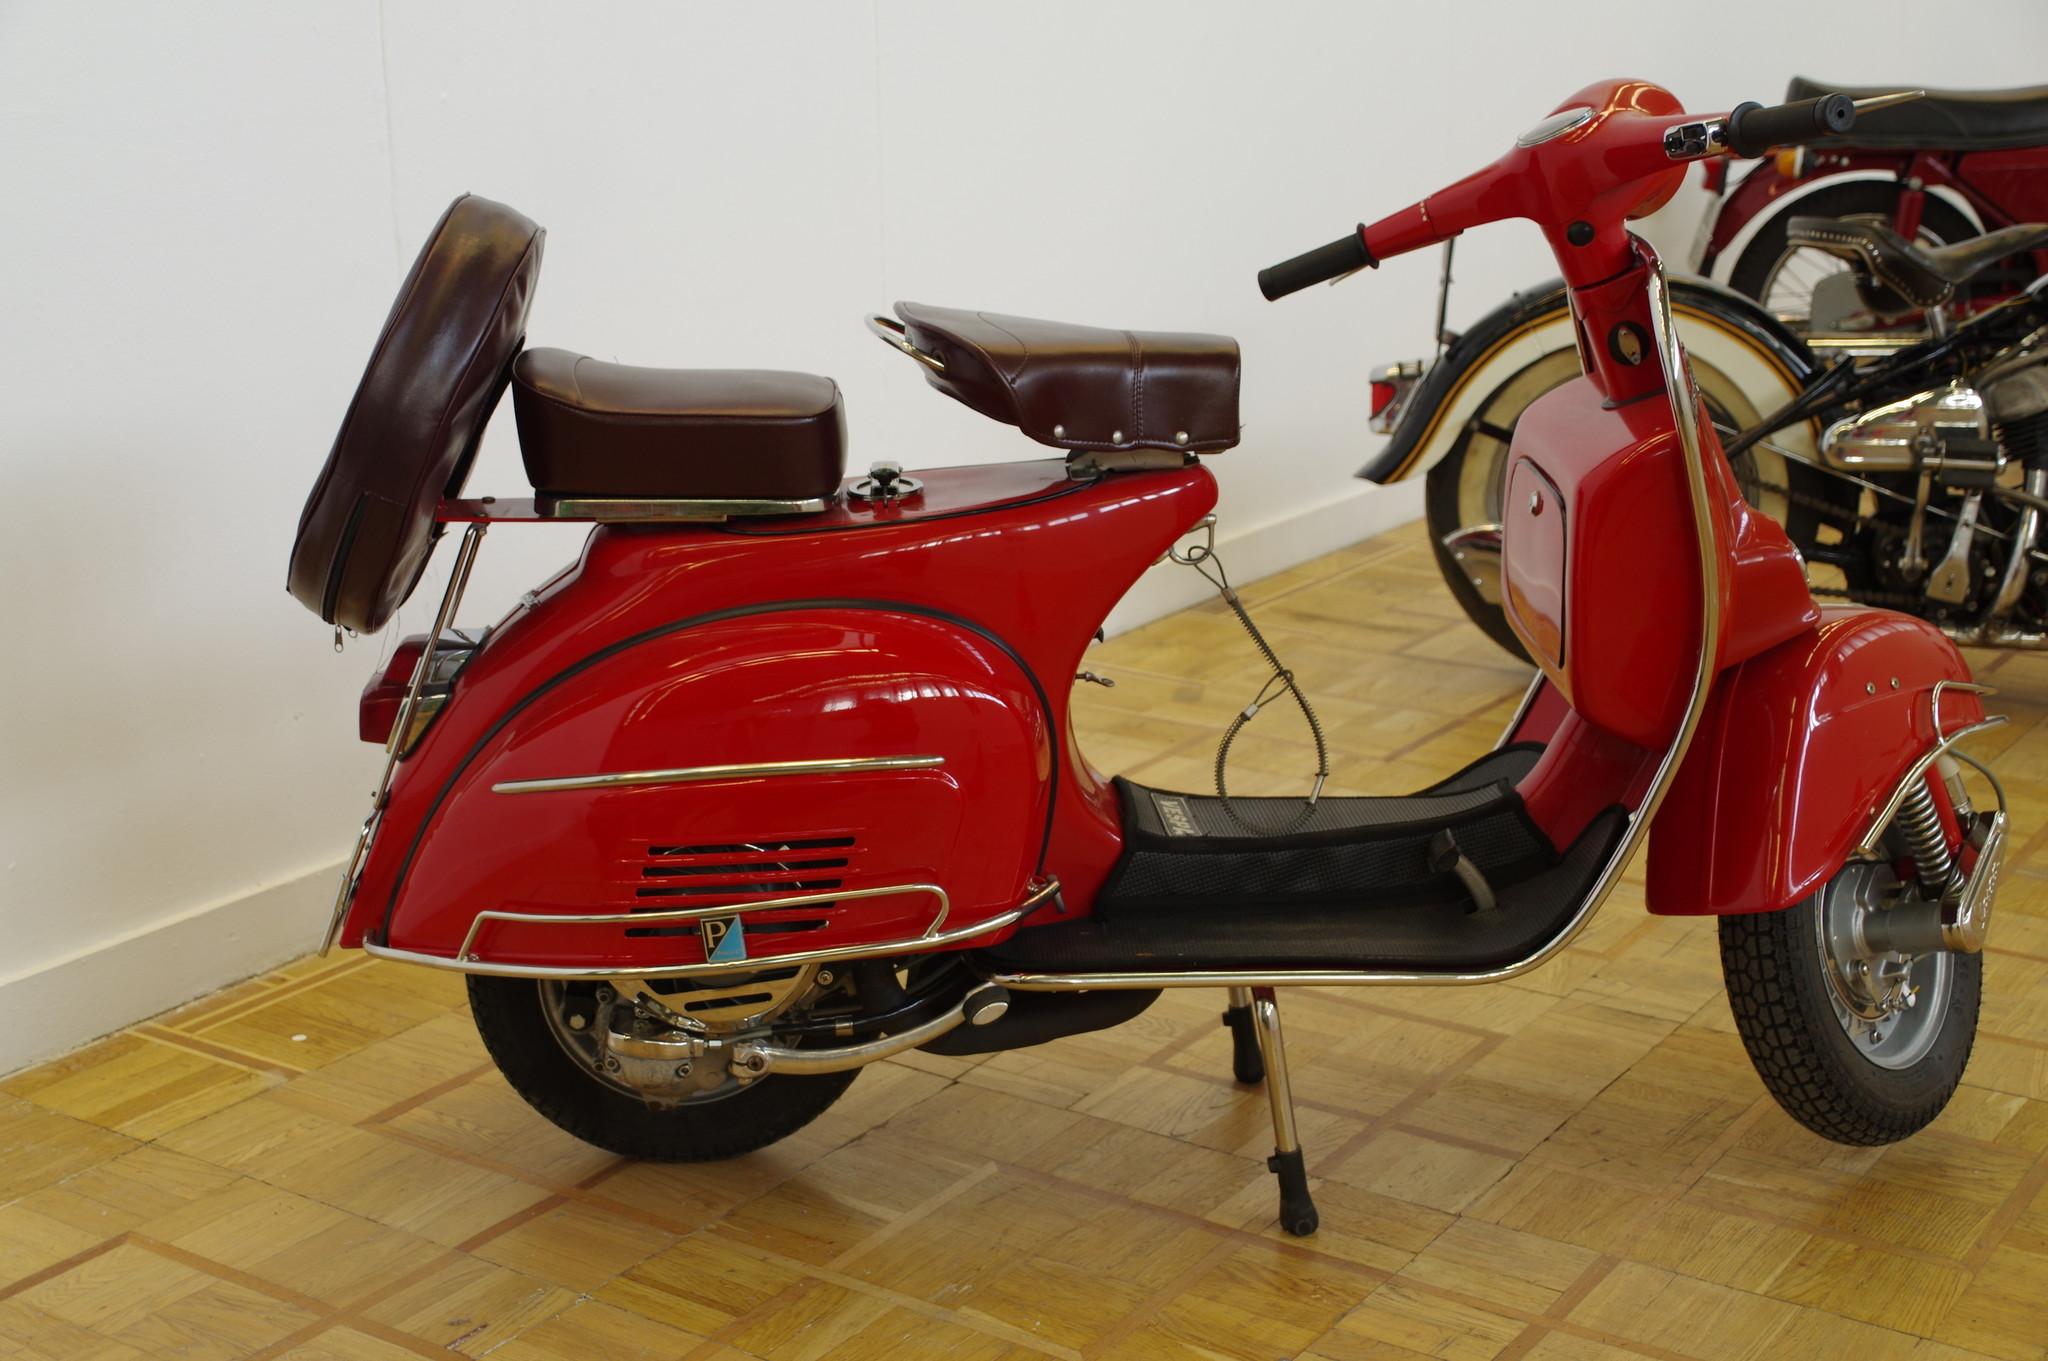 Мотороллер Vespa 150 Super 1966 года выпуска